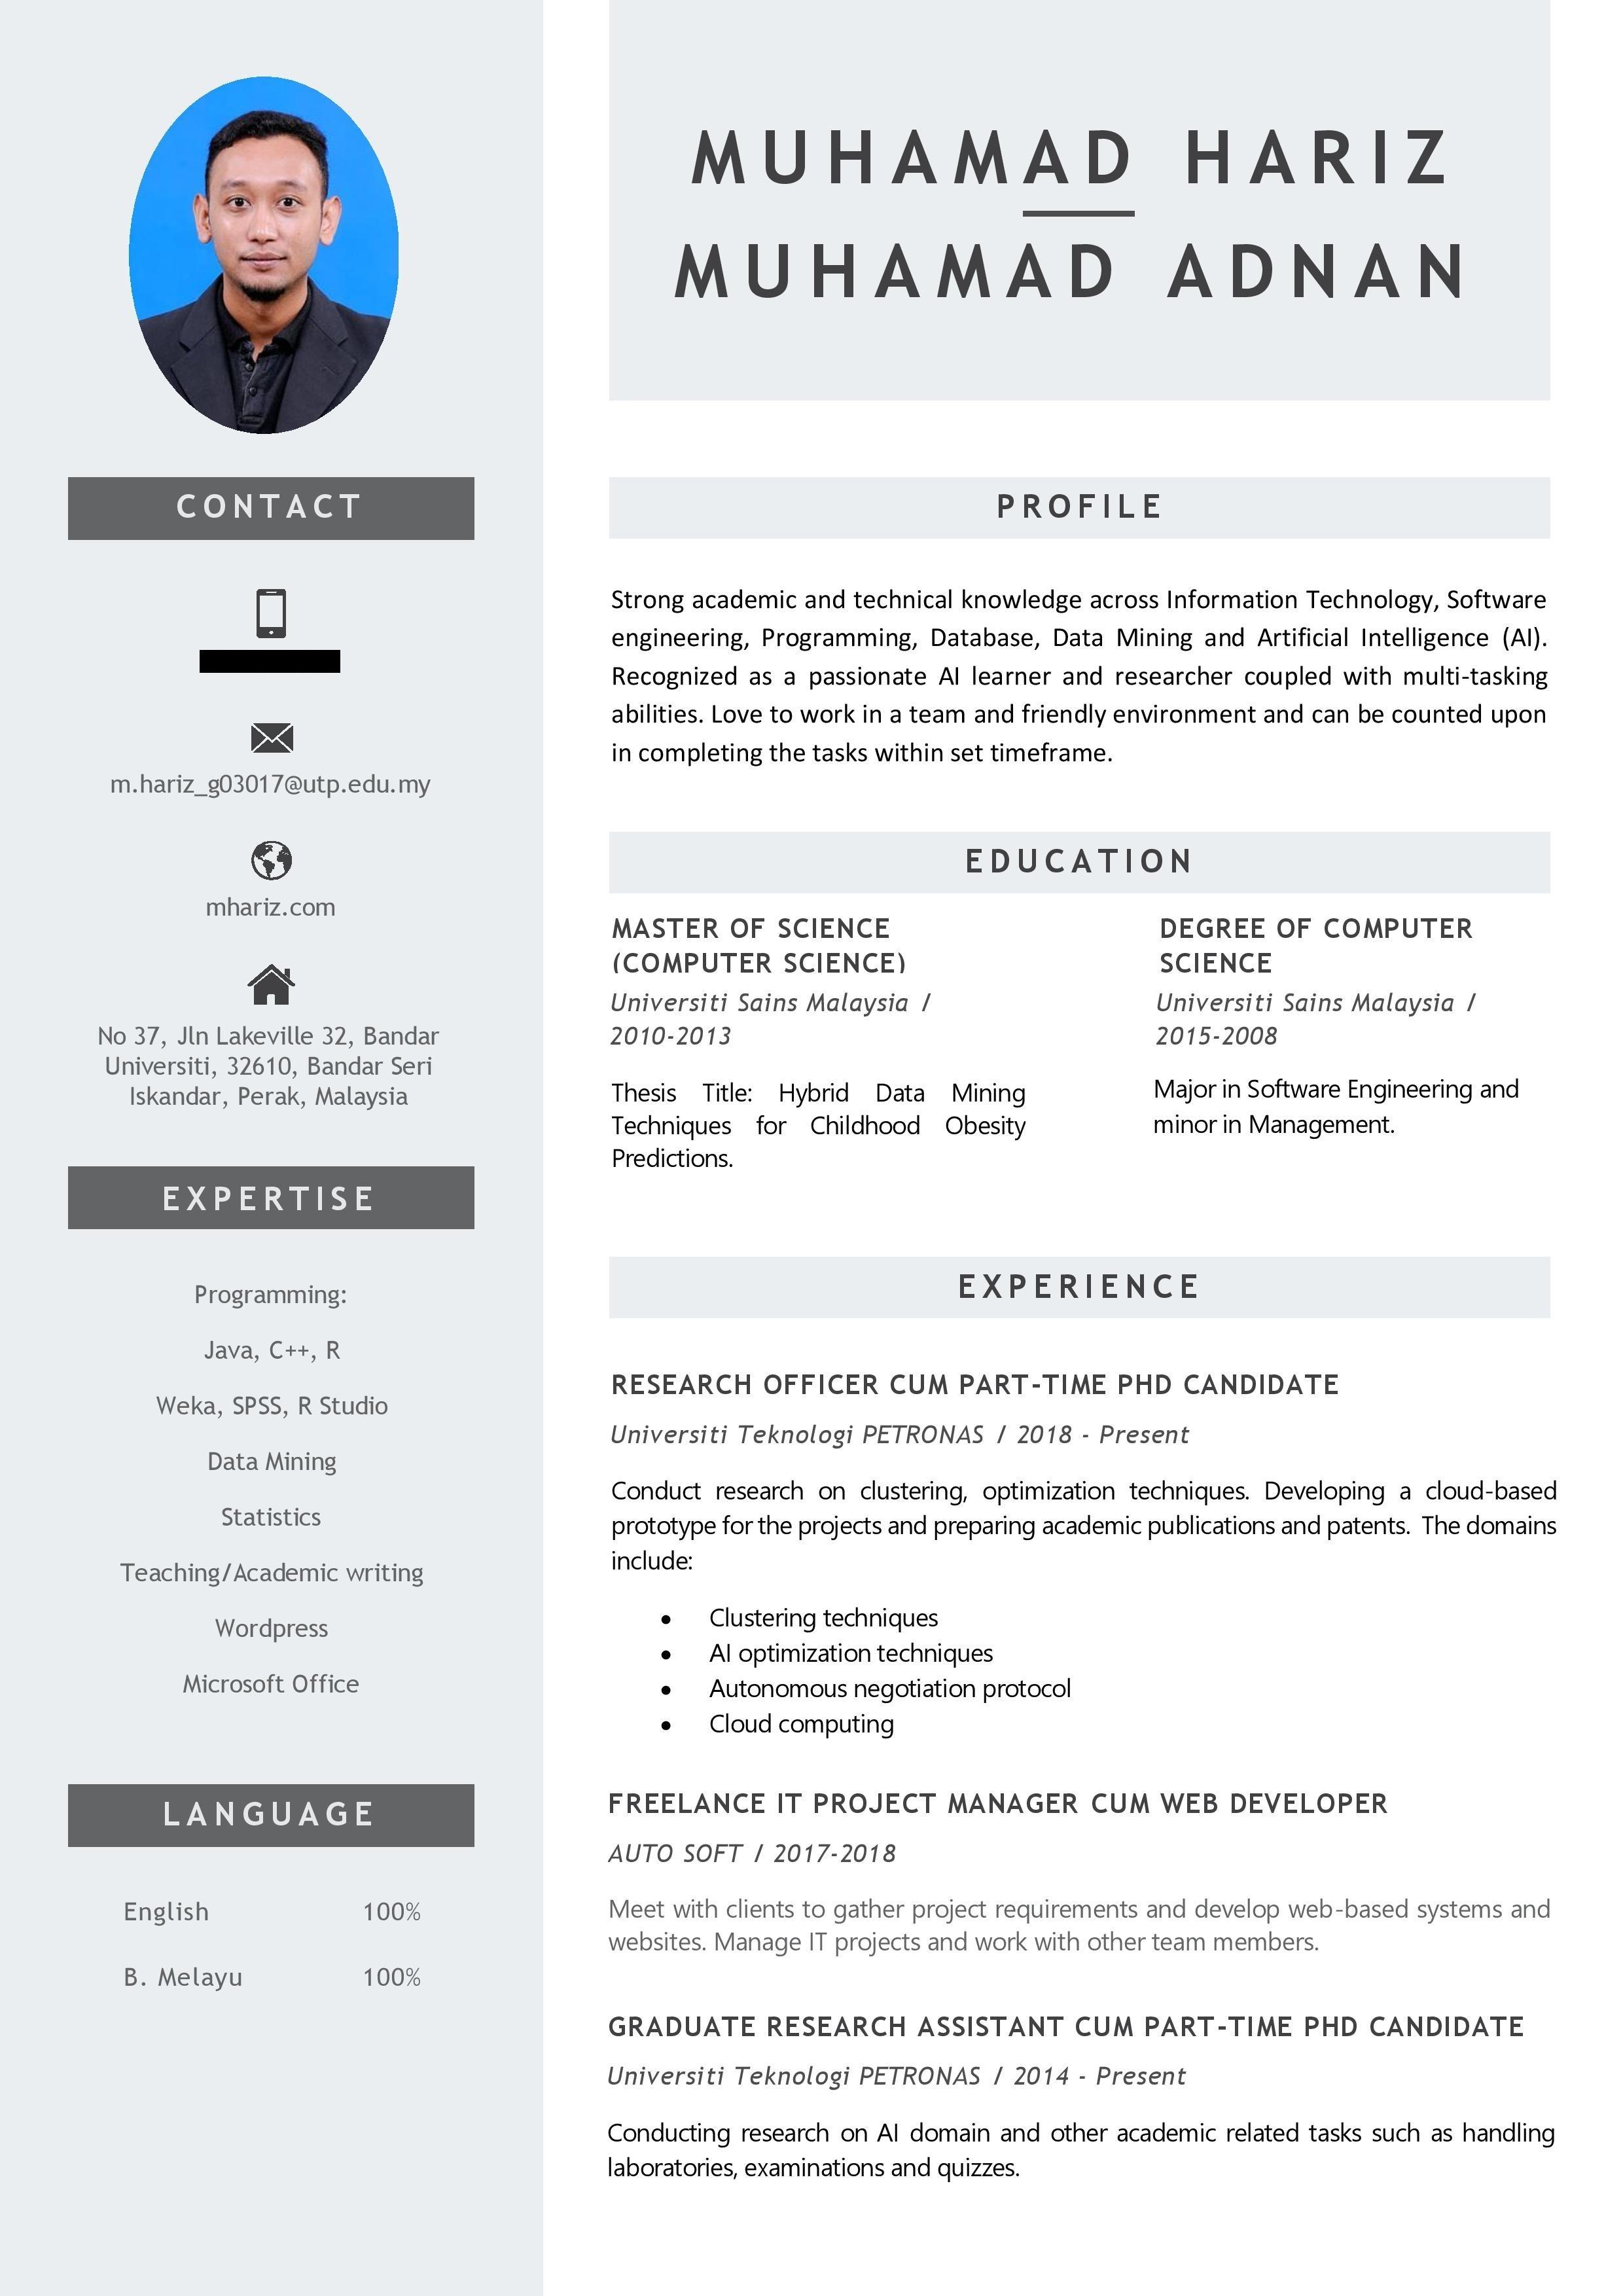 Contoh Resume Lengkap 2019 - BR1M Online